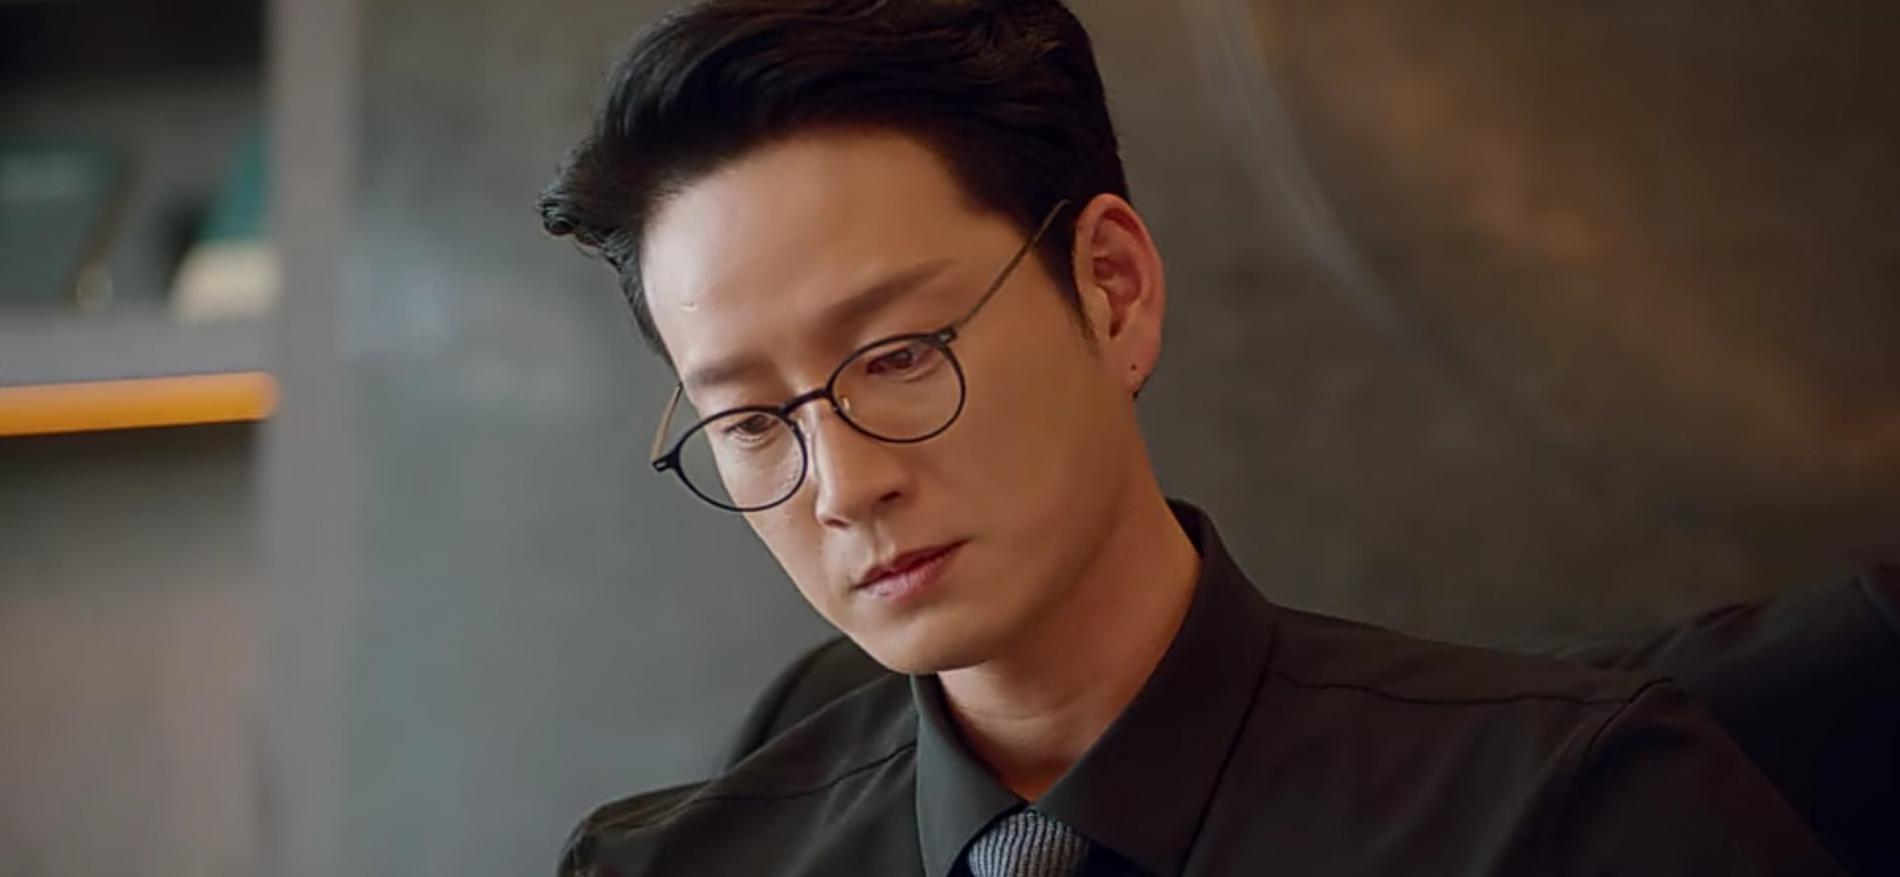 Drama Korea Mine Episode 13 Full Sub Indo, Semua Orang Berbohong